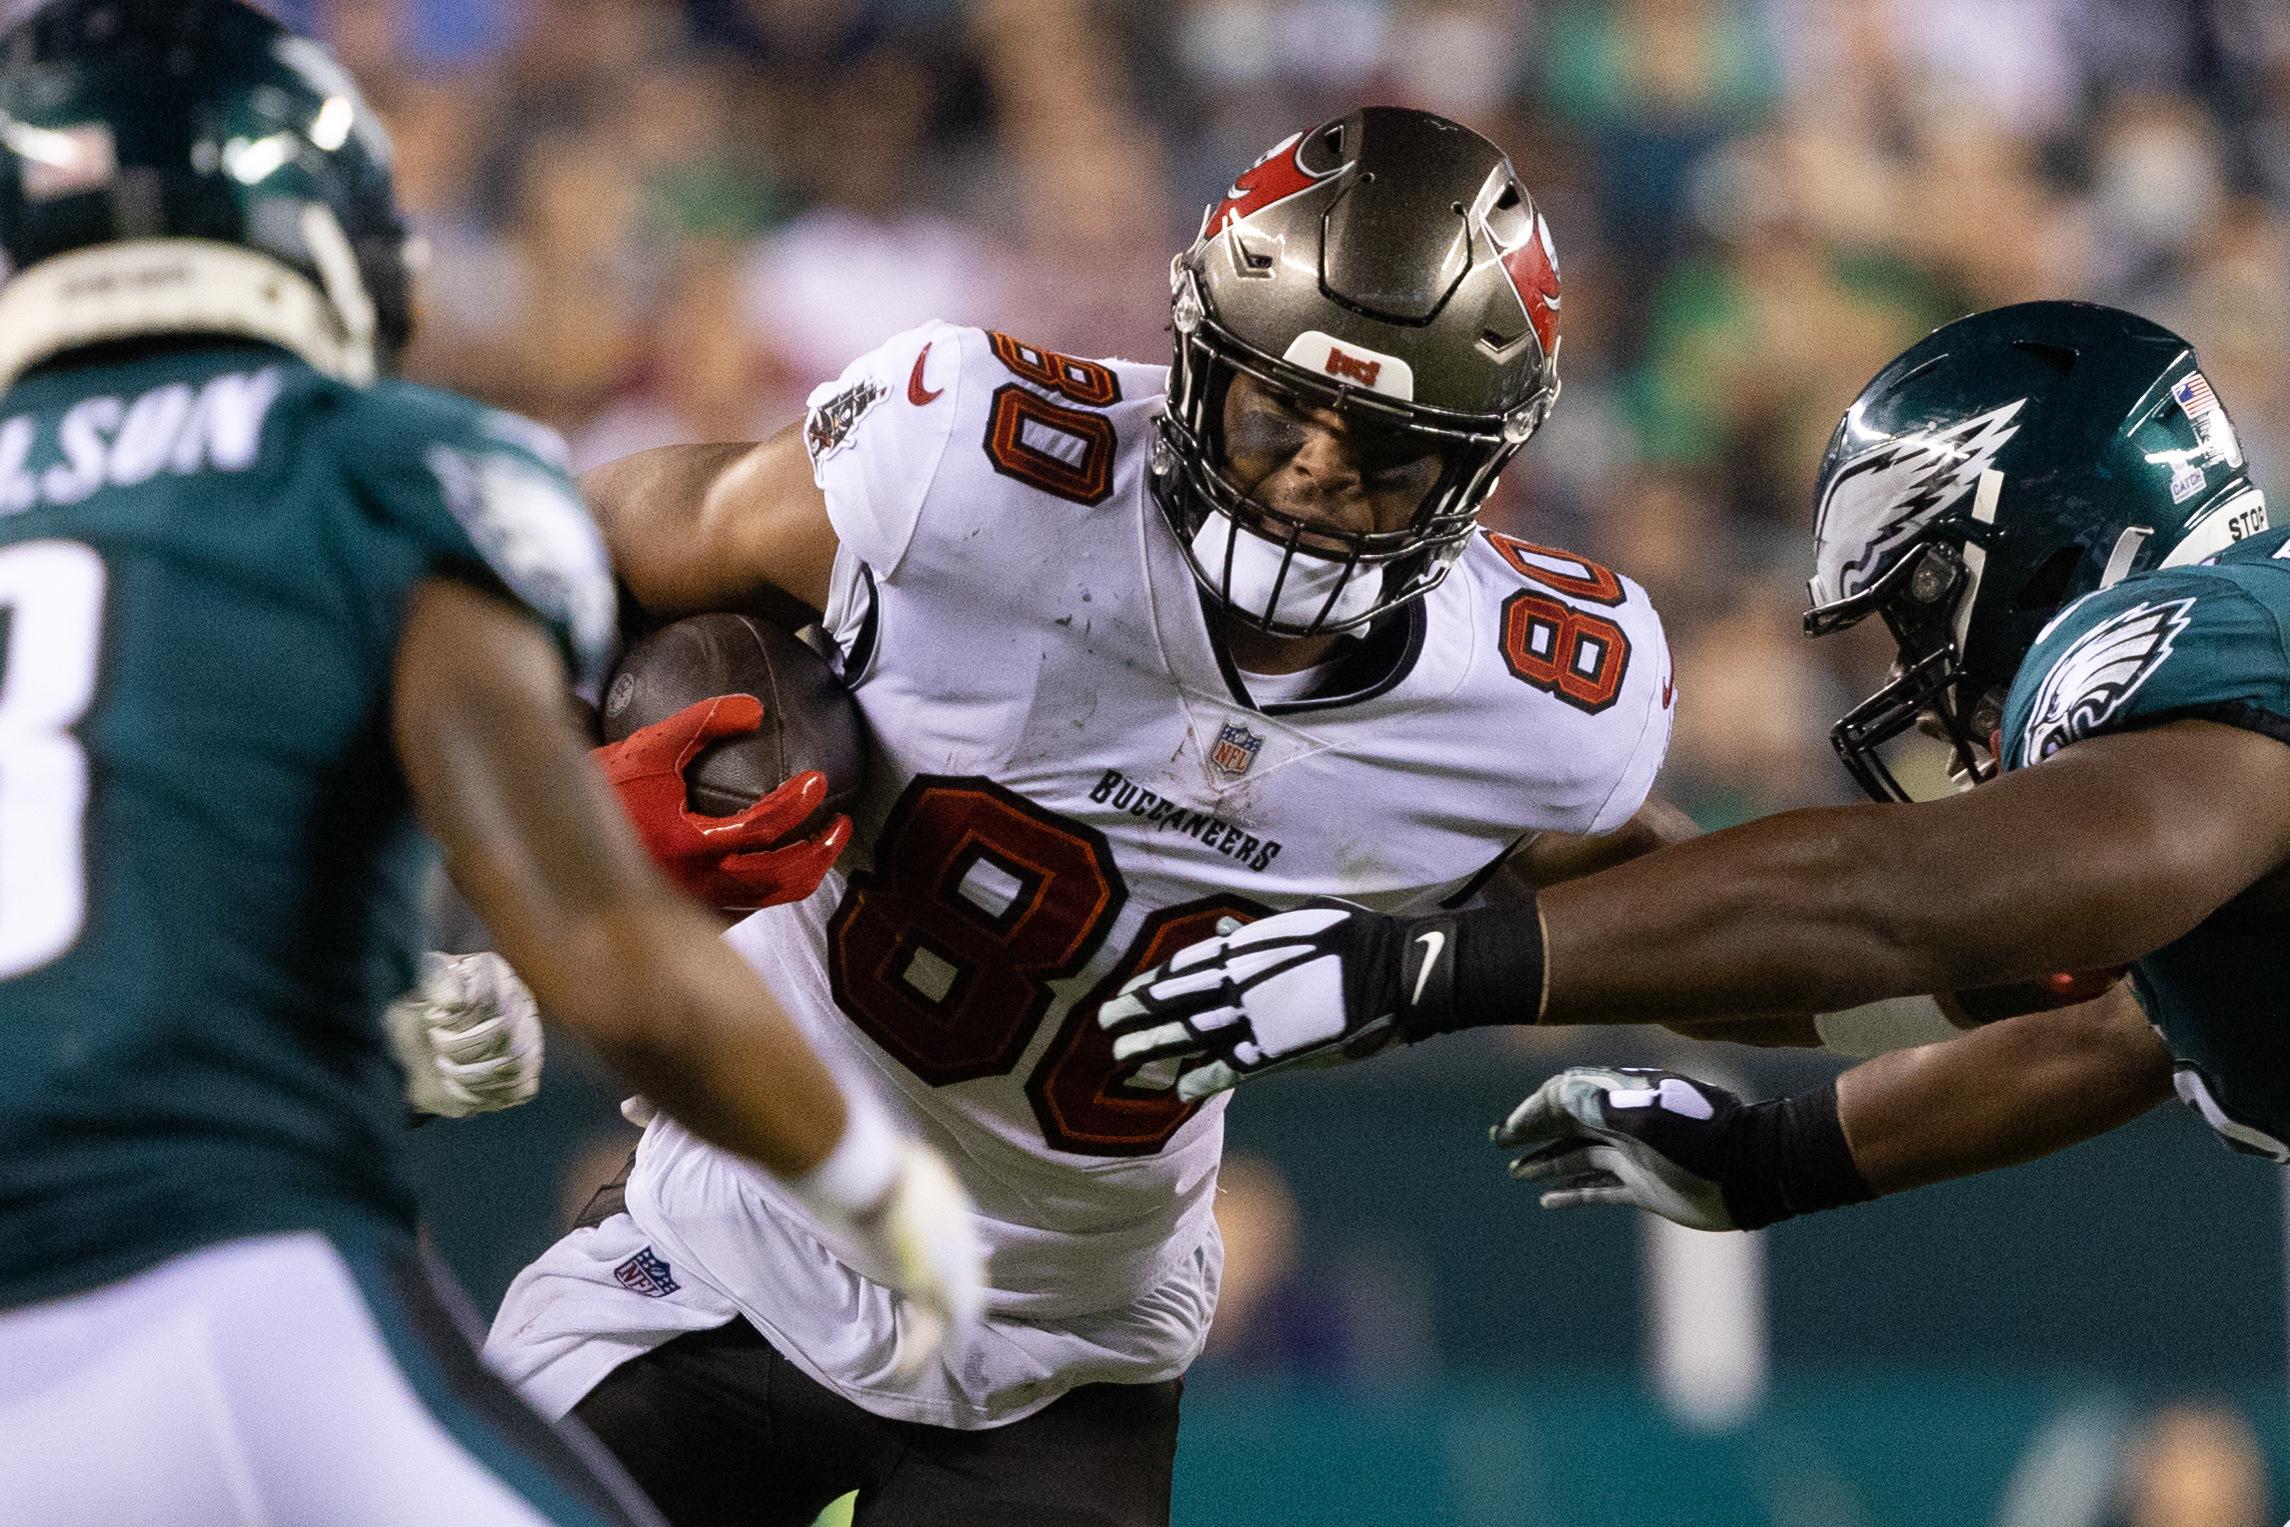 NFL: Tampa Bay Buccaneers at Philadelphia Eagles